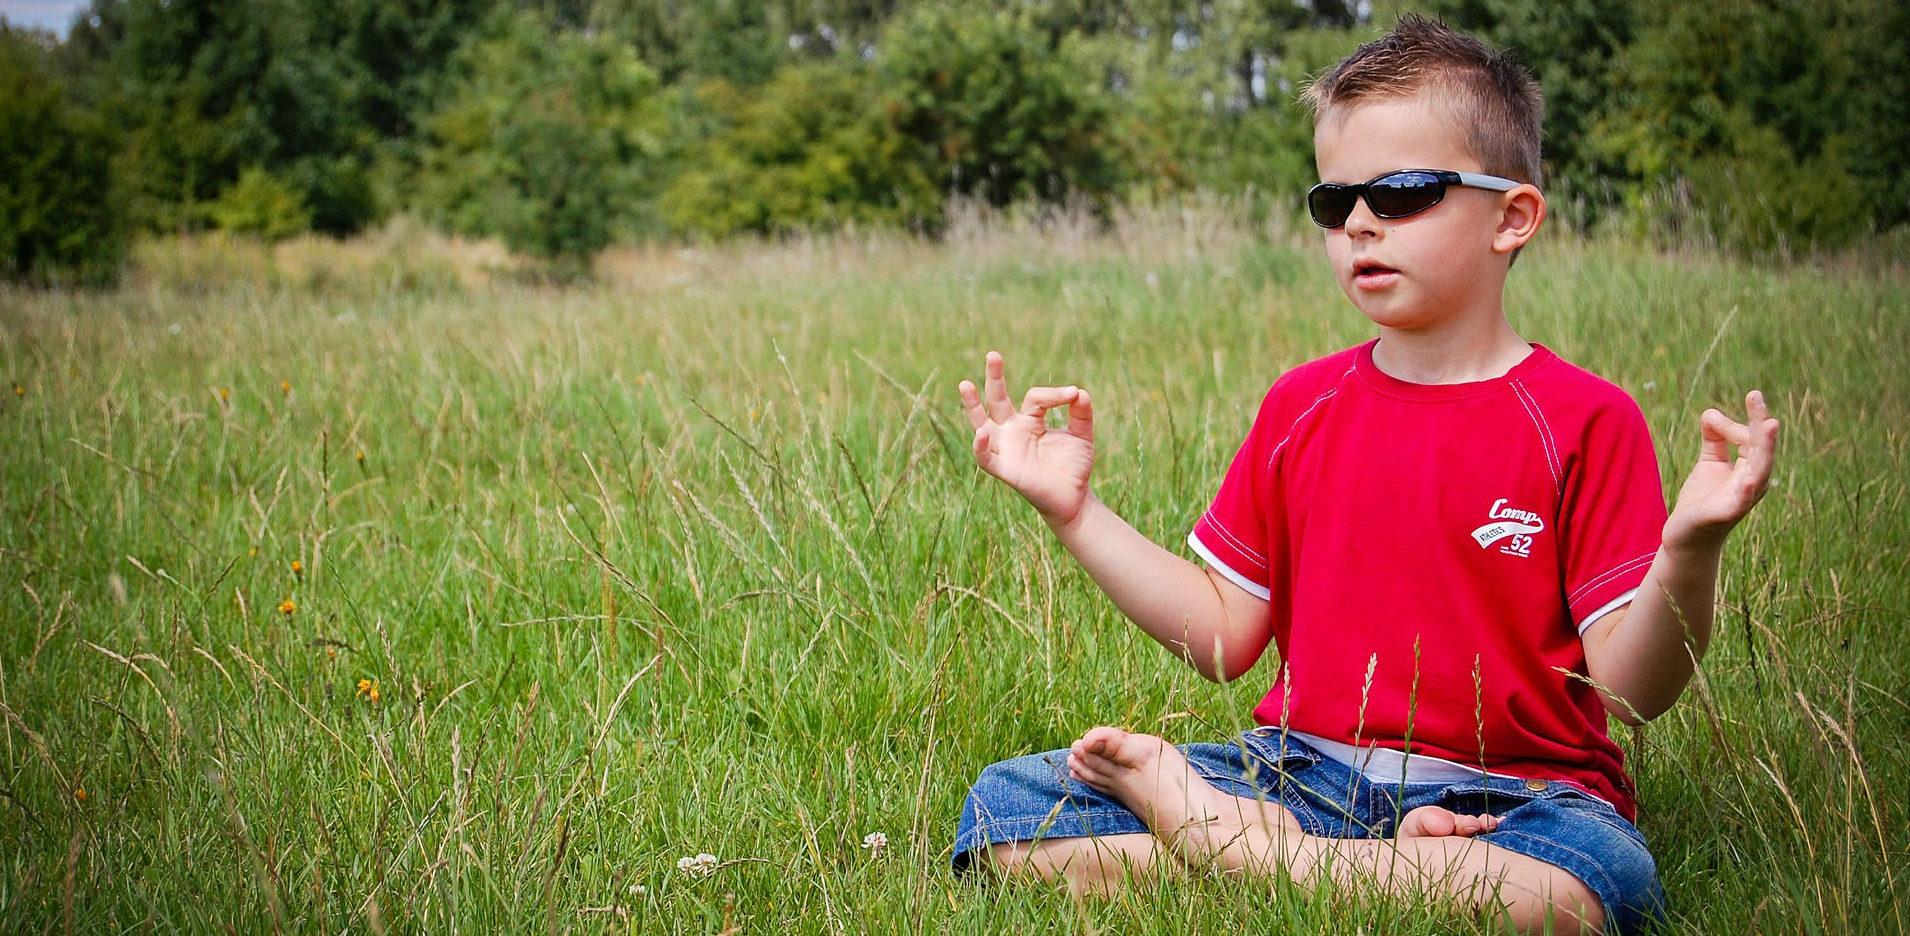 meditation-428382_1920-e1494012843692